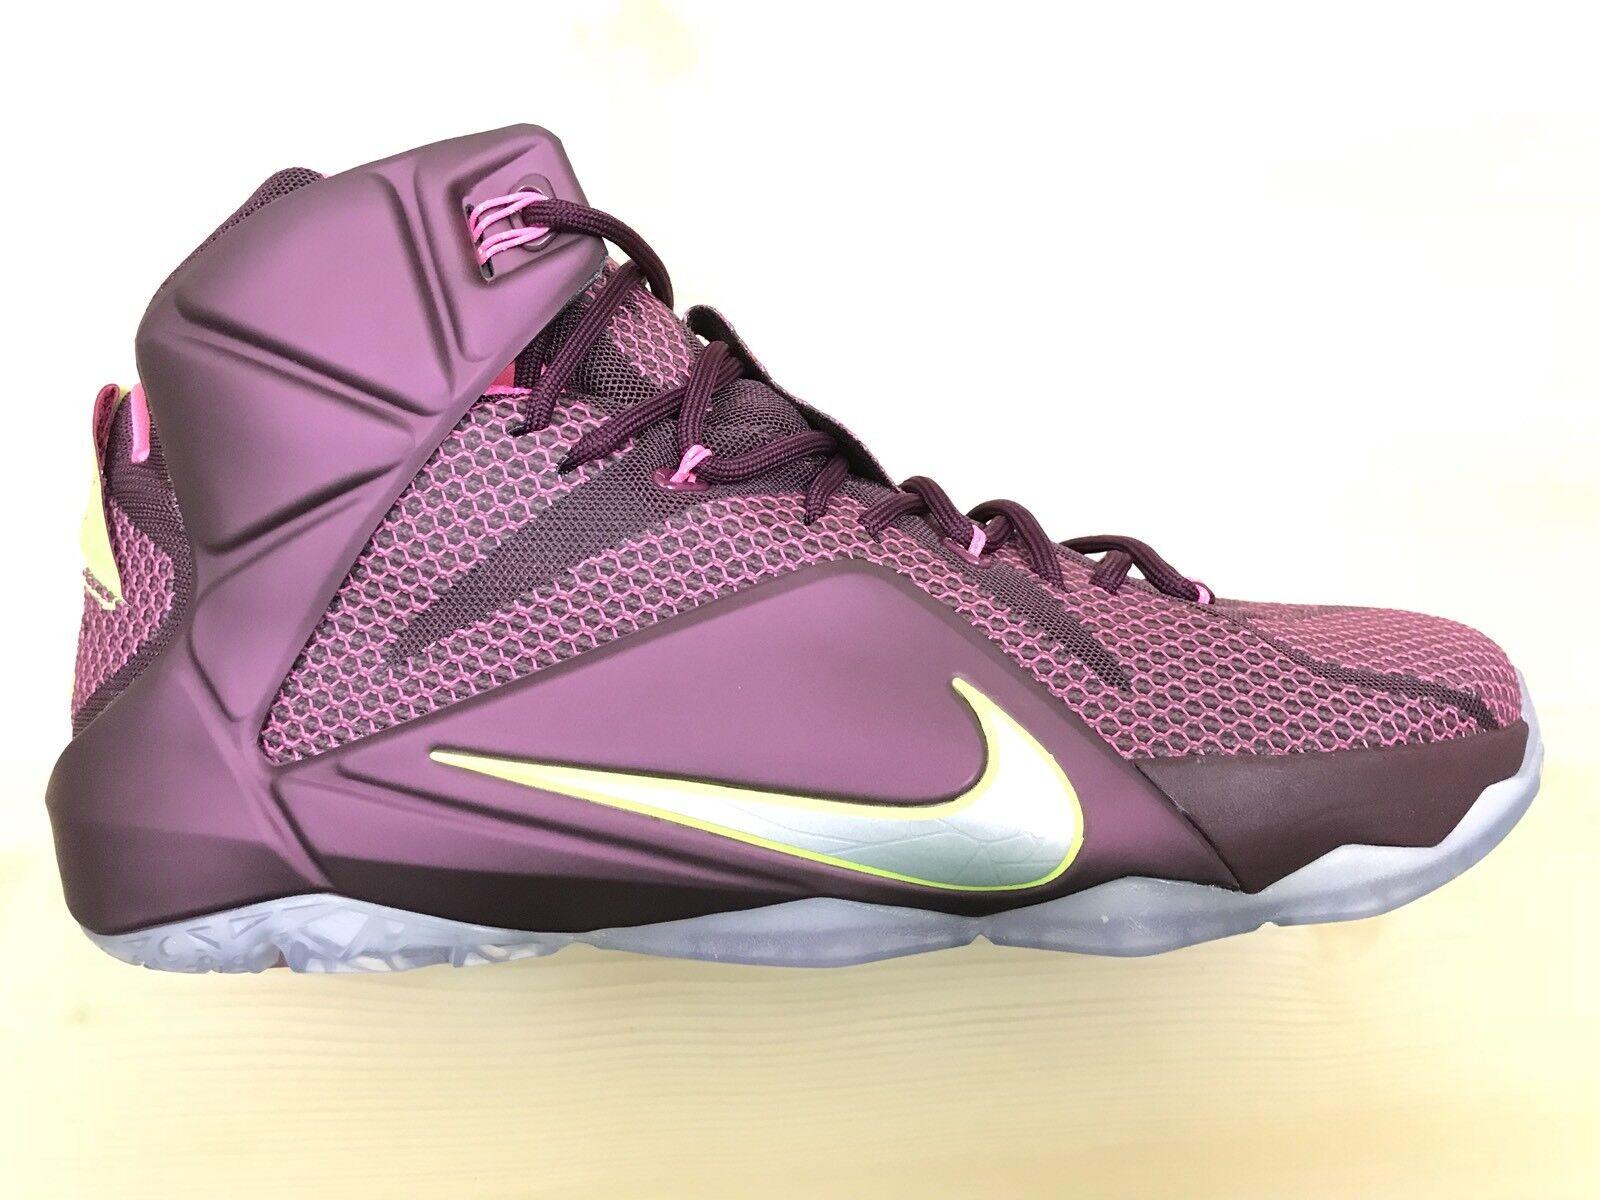 Nike lebron 12 xii doppelhelix mens  11 basketball basketball 11 - schuhe 684593-607 neue b45fa2